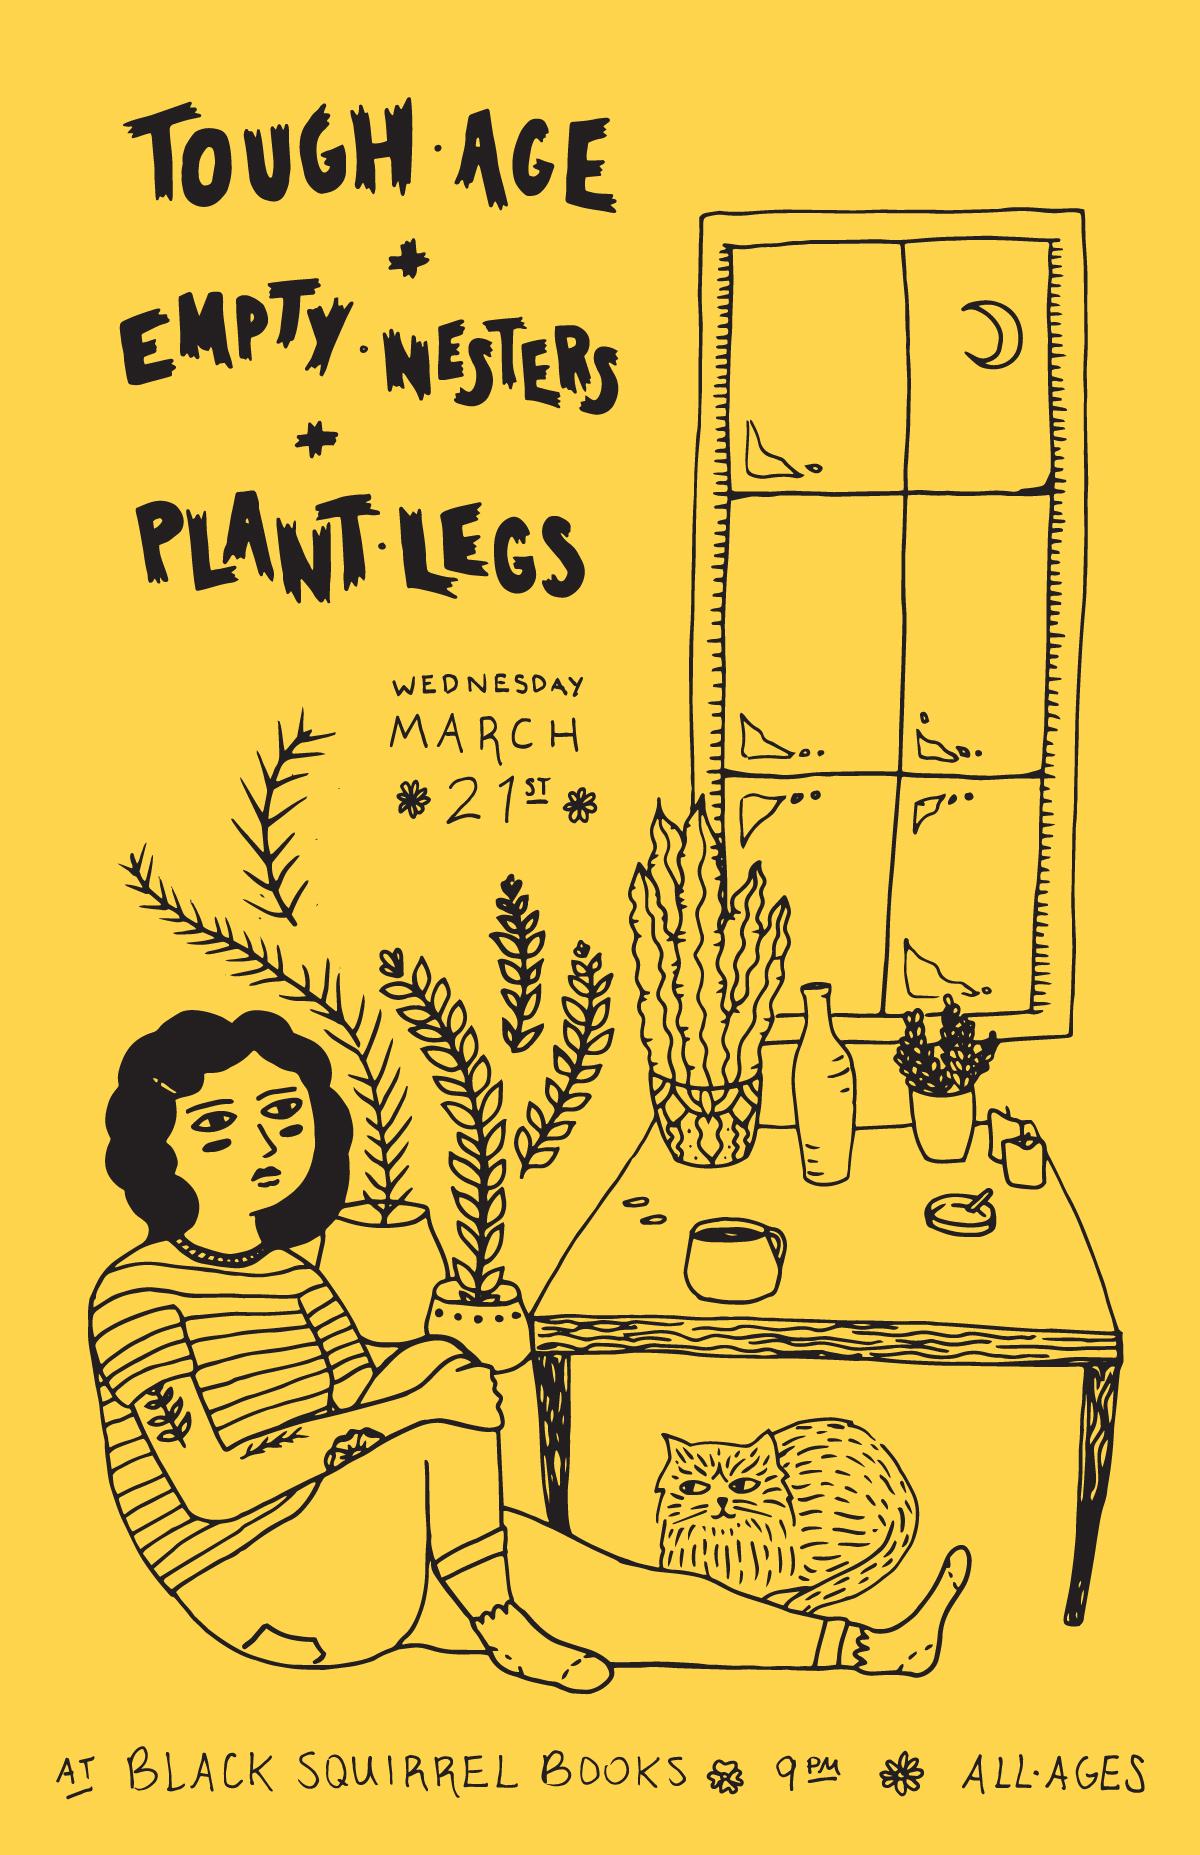 plant legs show poster by robin richardson-dupuis